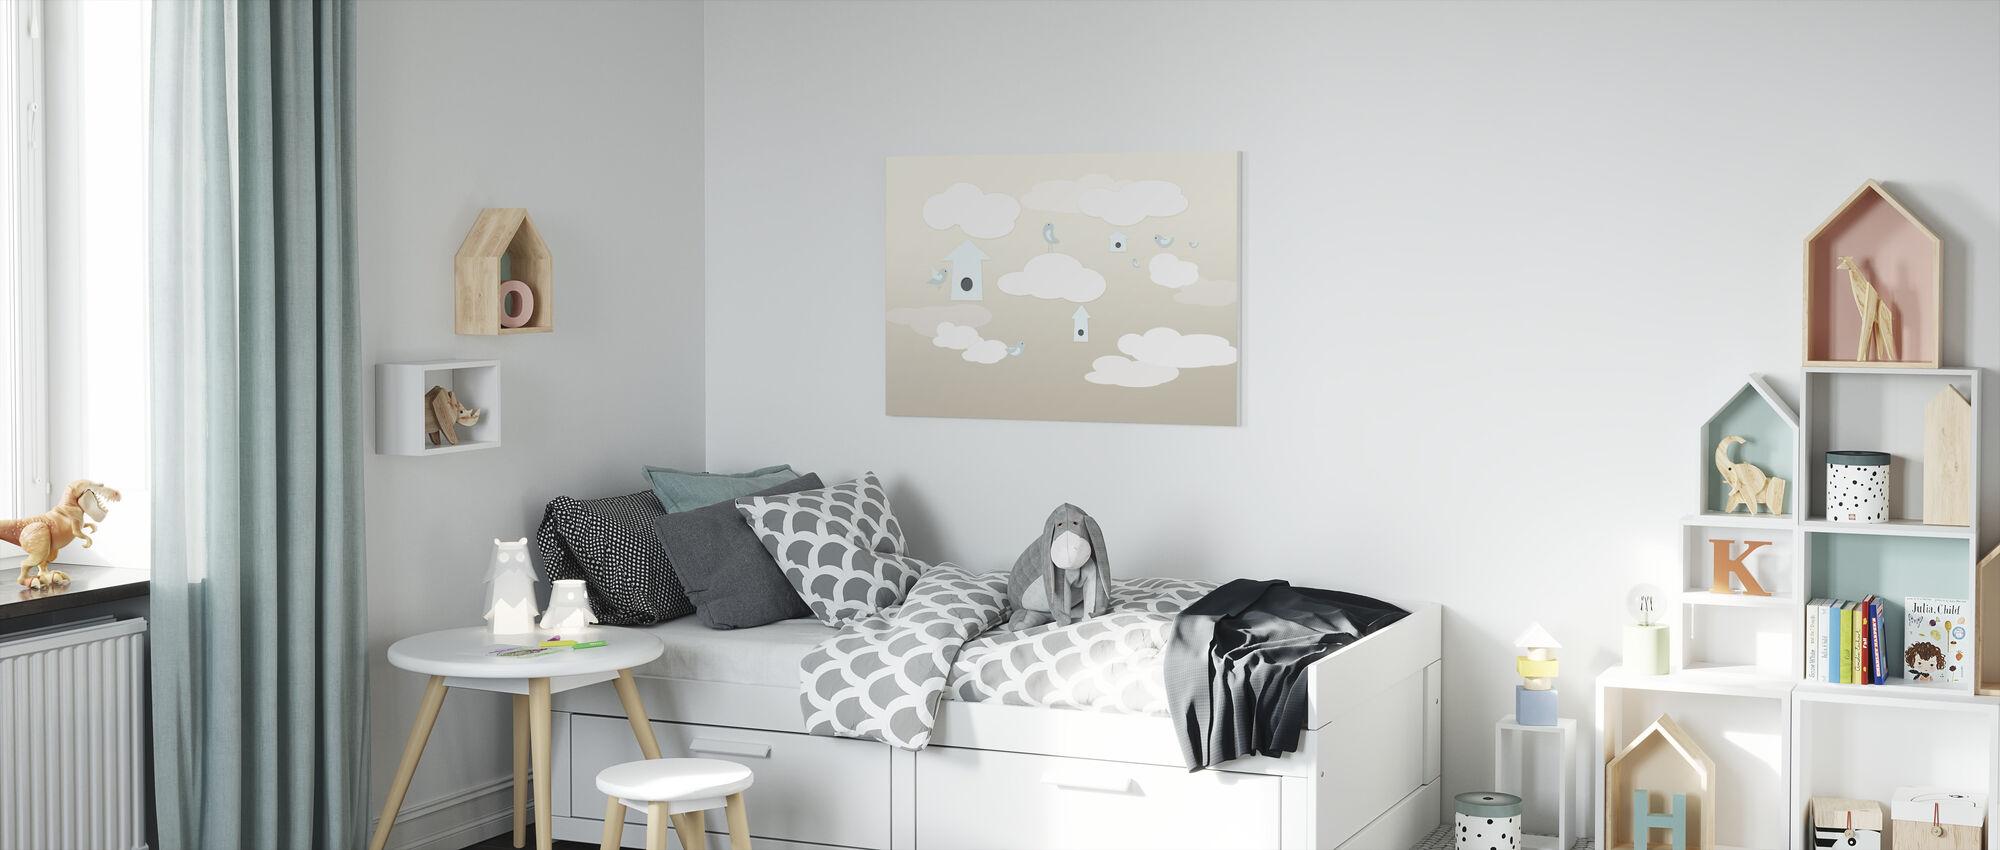 Birds Up High - Canvas print - Kids Room